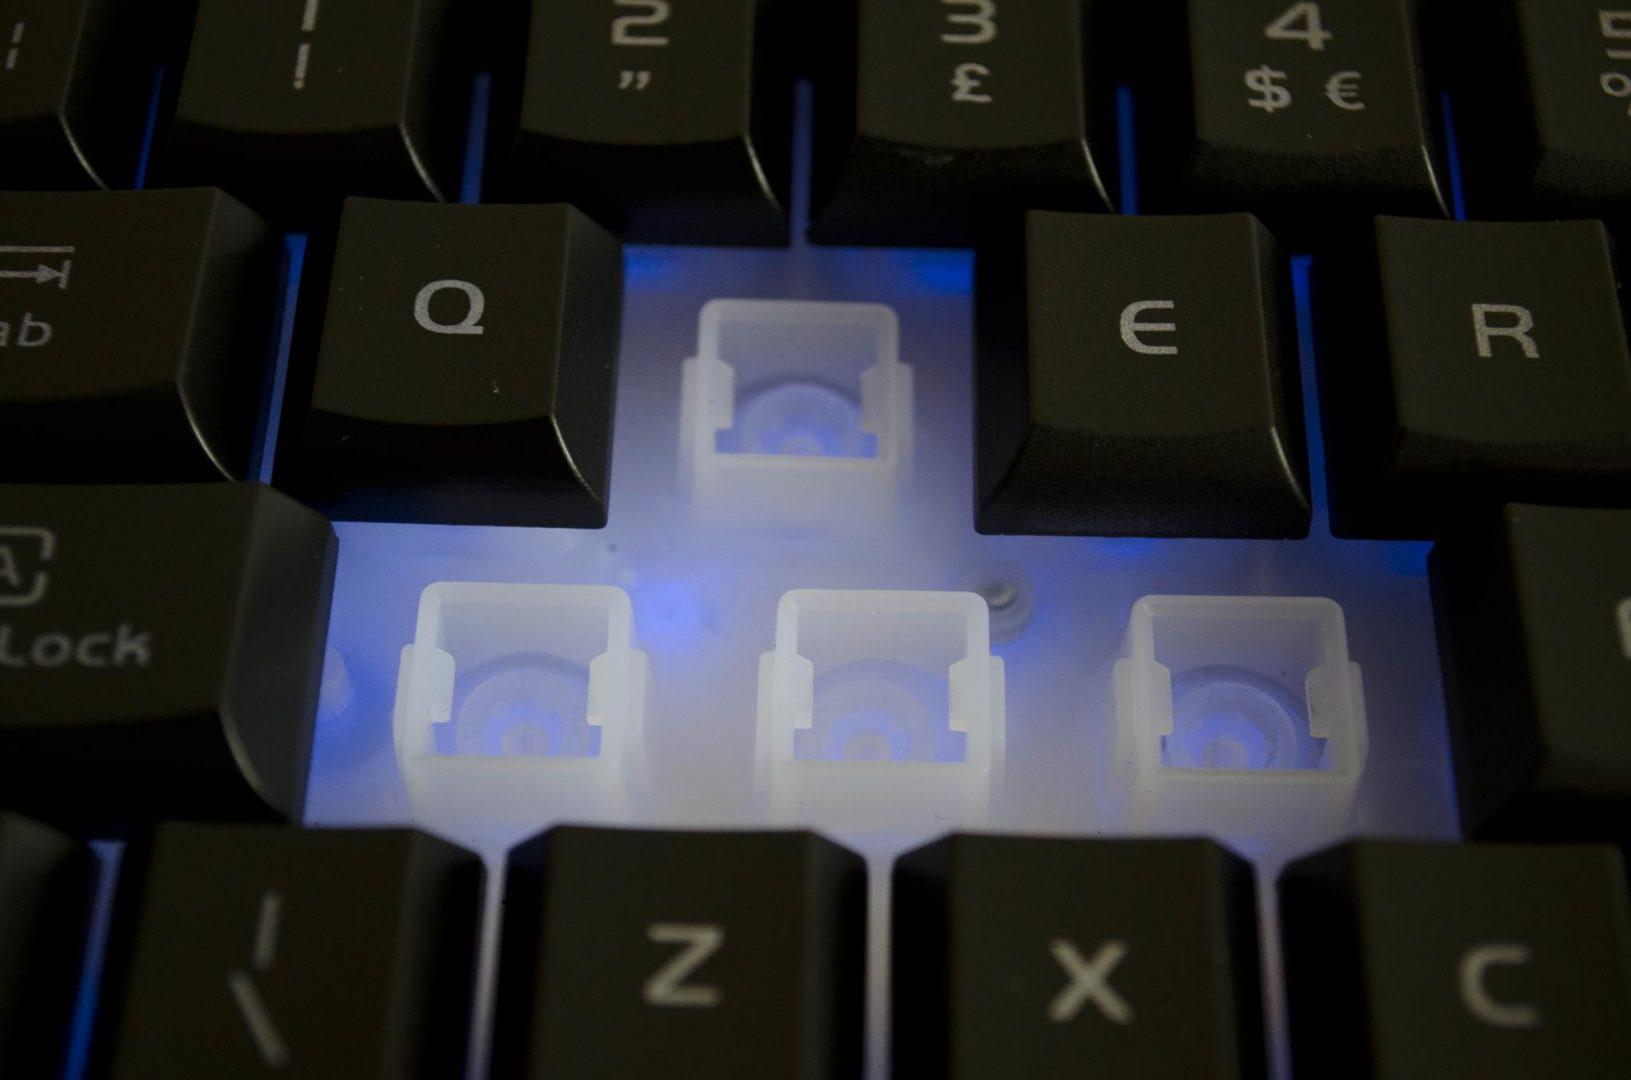 Tt eSPORTS Challenger Prime Gaming Keyboard_9